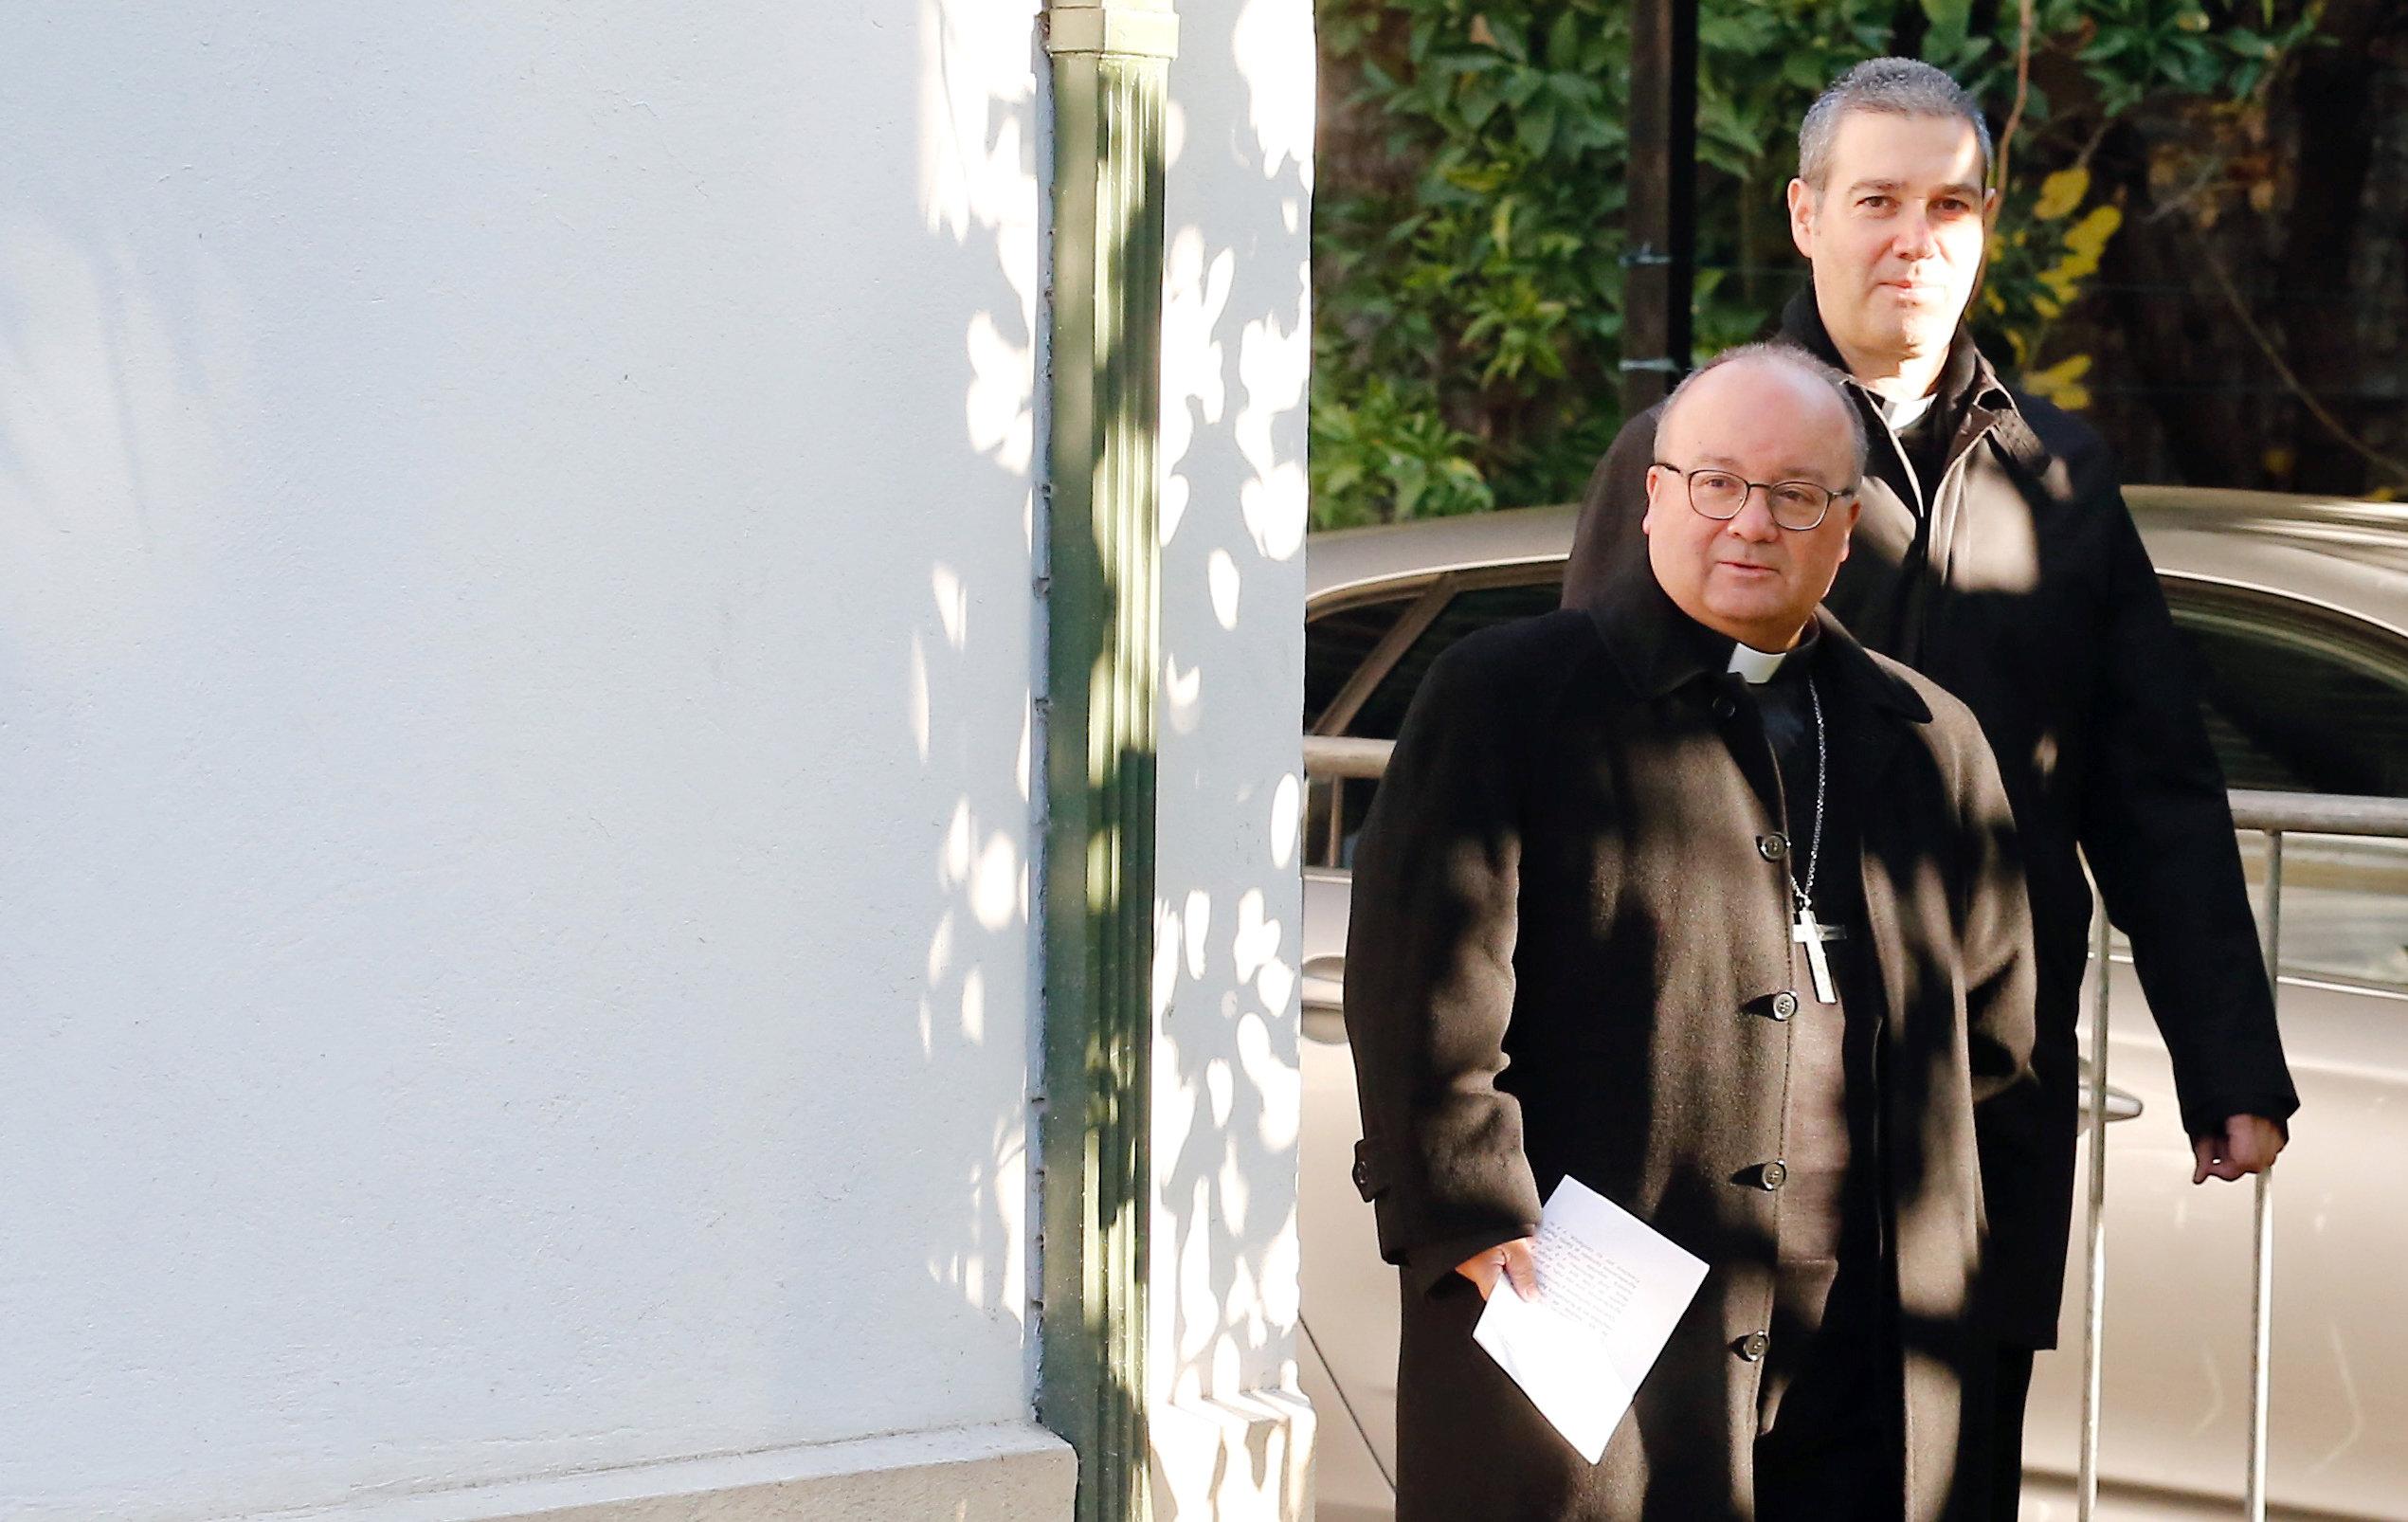 Charles Scicluna and Jordi Bertomeu